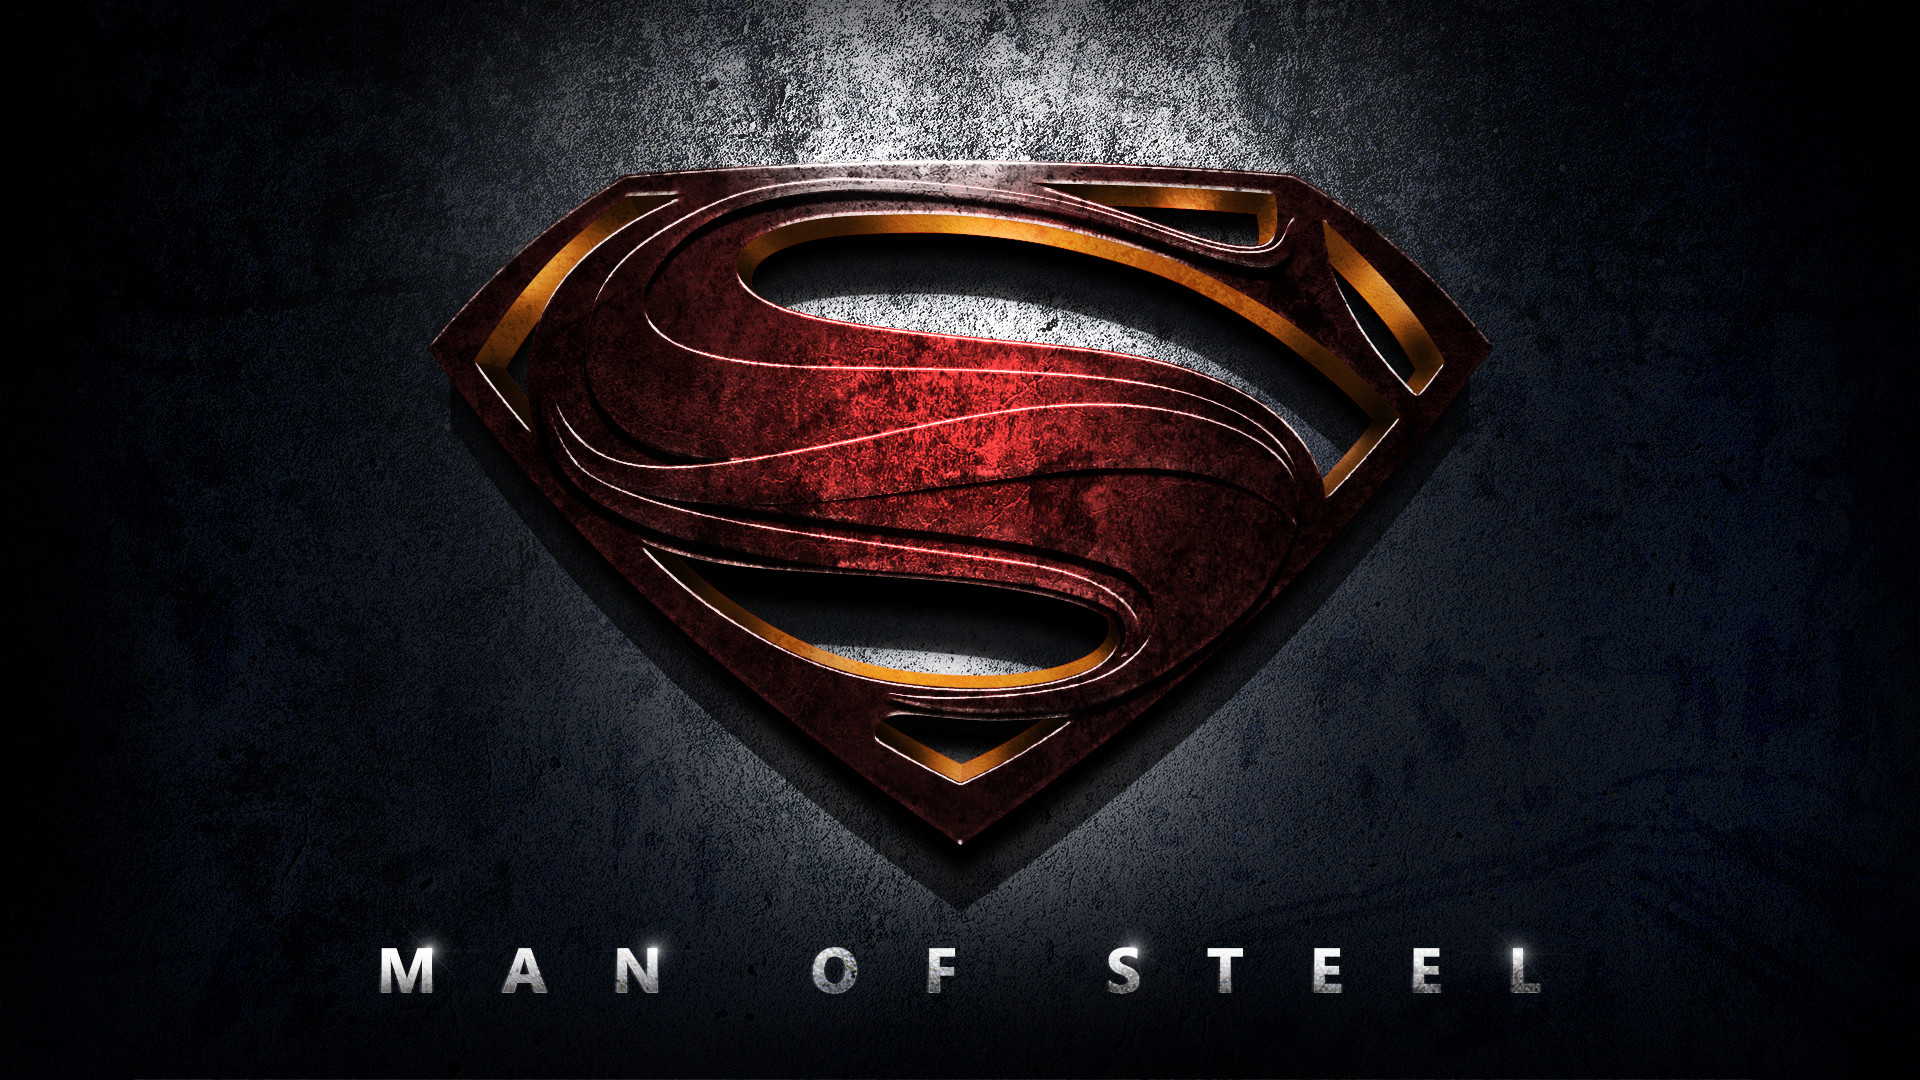 Movie_Man Of Steel_403870 man_of_steel_wallpaper_by_symplearts-d68zqi8